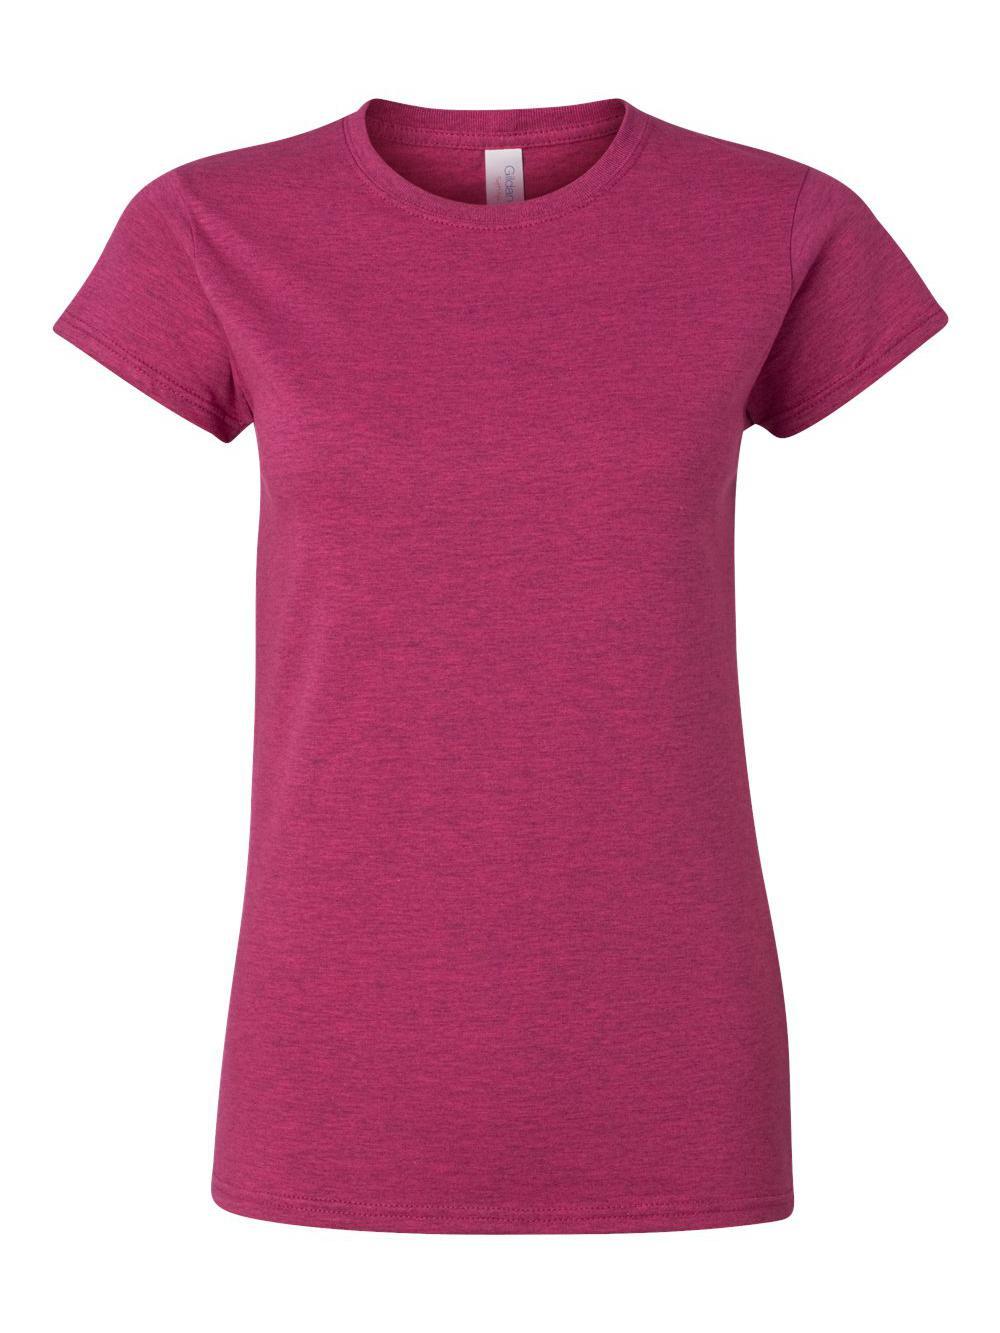 Gildan-Softstyle-Women-039-s-T-Shirt-64000L thumbnail 3